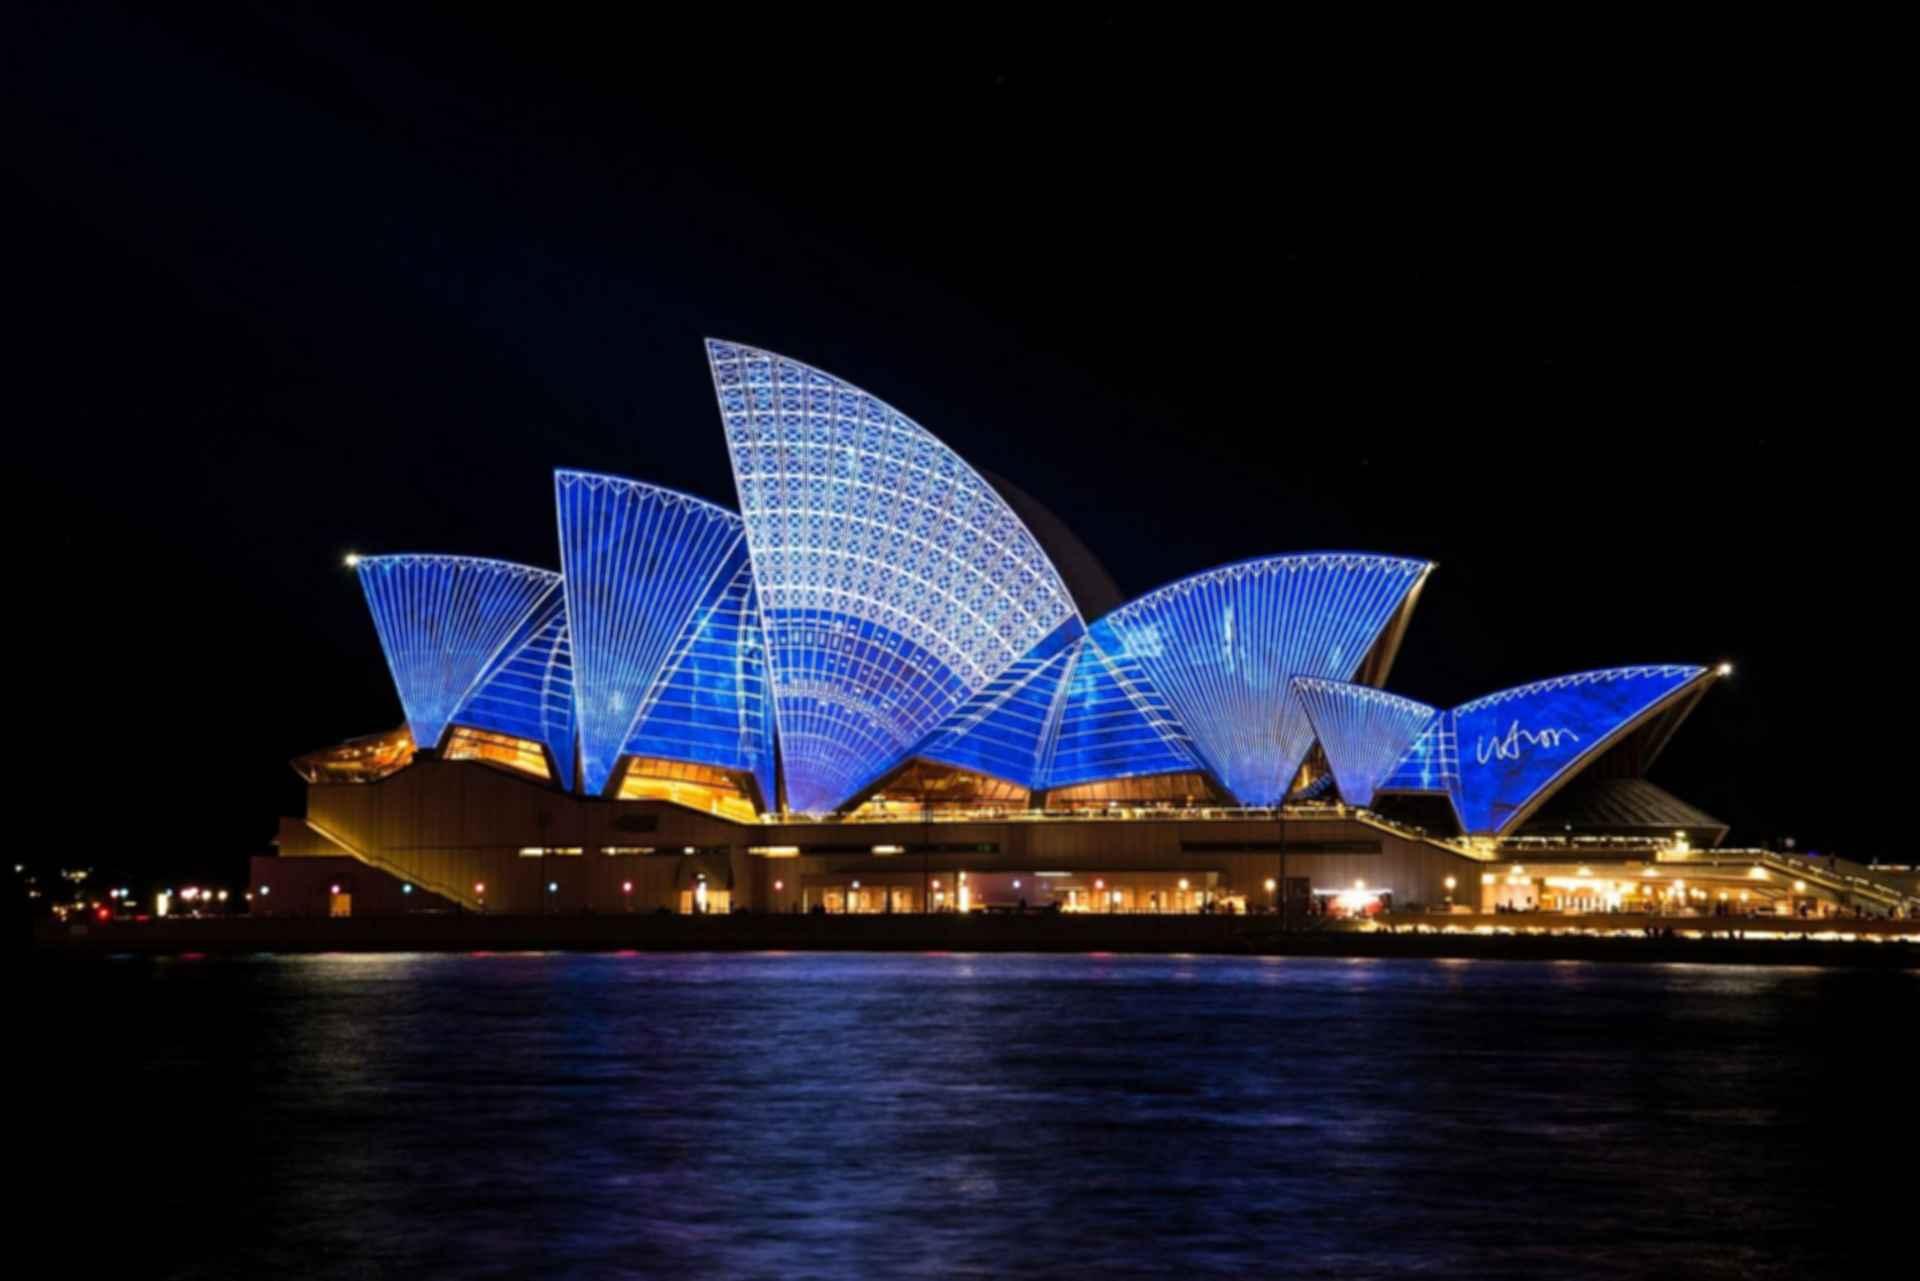 Sydney Opera House - Roof Lit Up